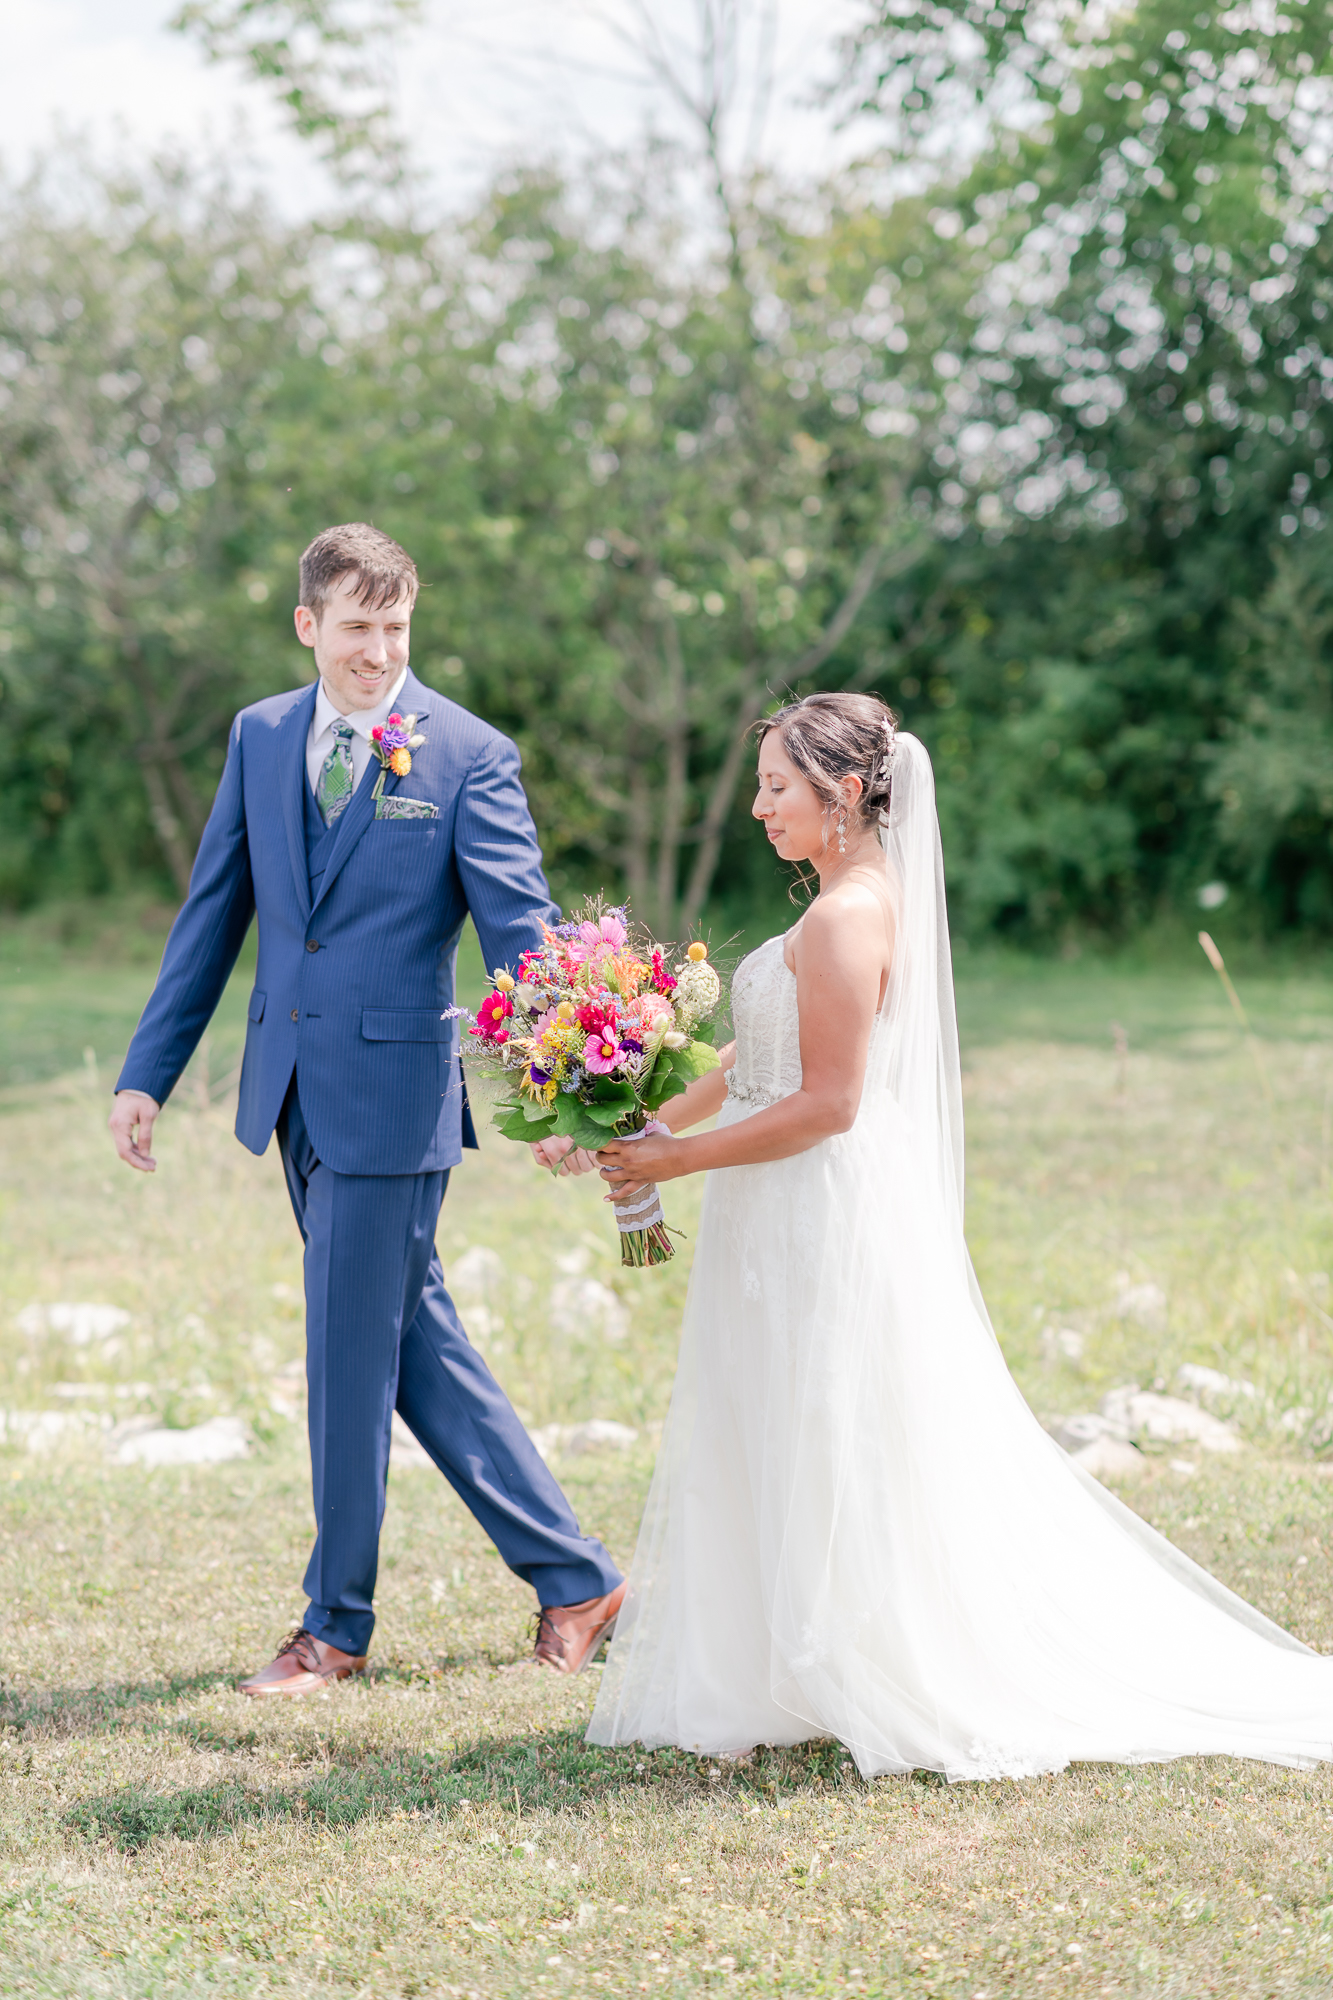 Maria+Adam_Summer Barn Wedding_The Barn and The North Star Preserve_Oberlin_Ohio-143.jpg